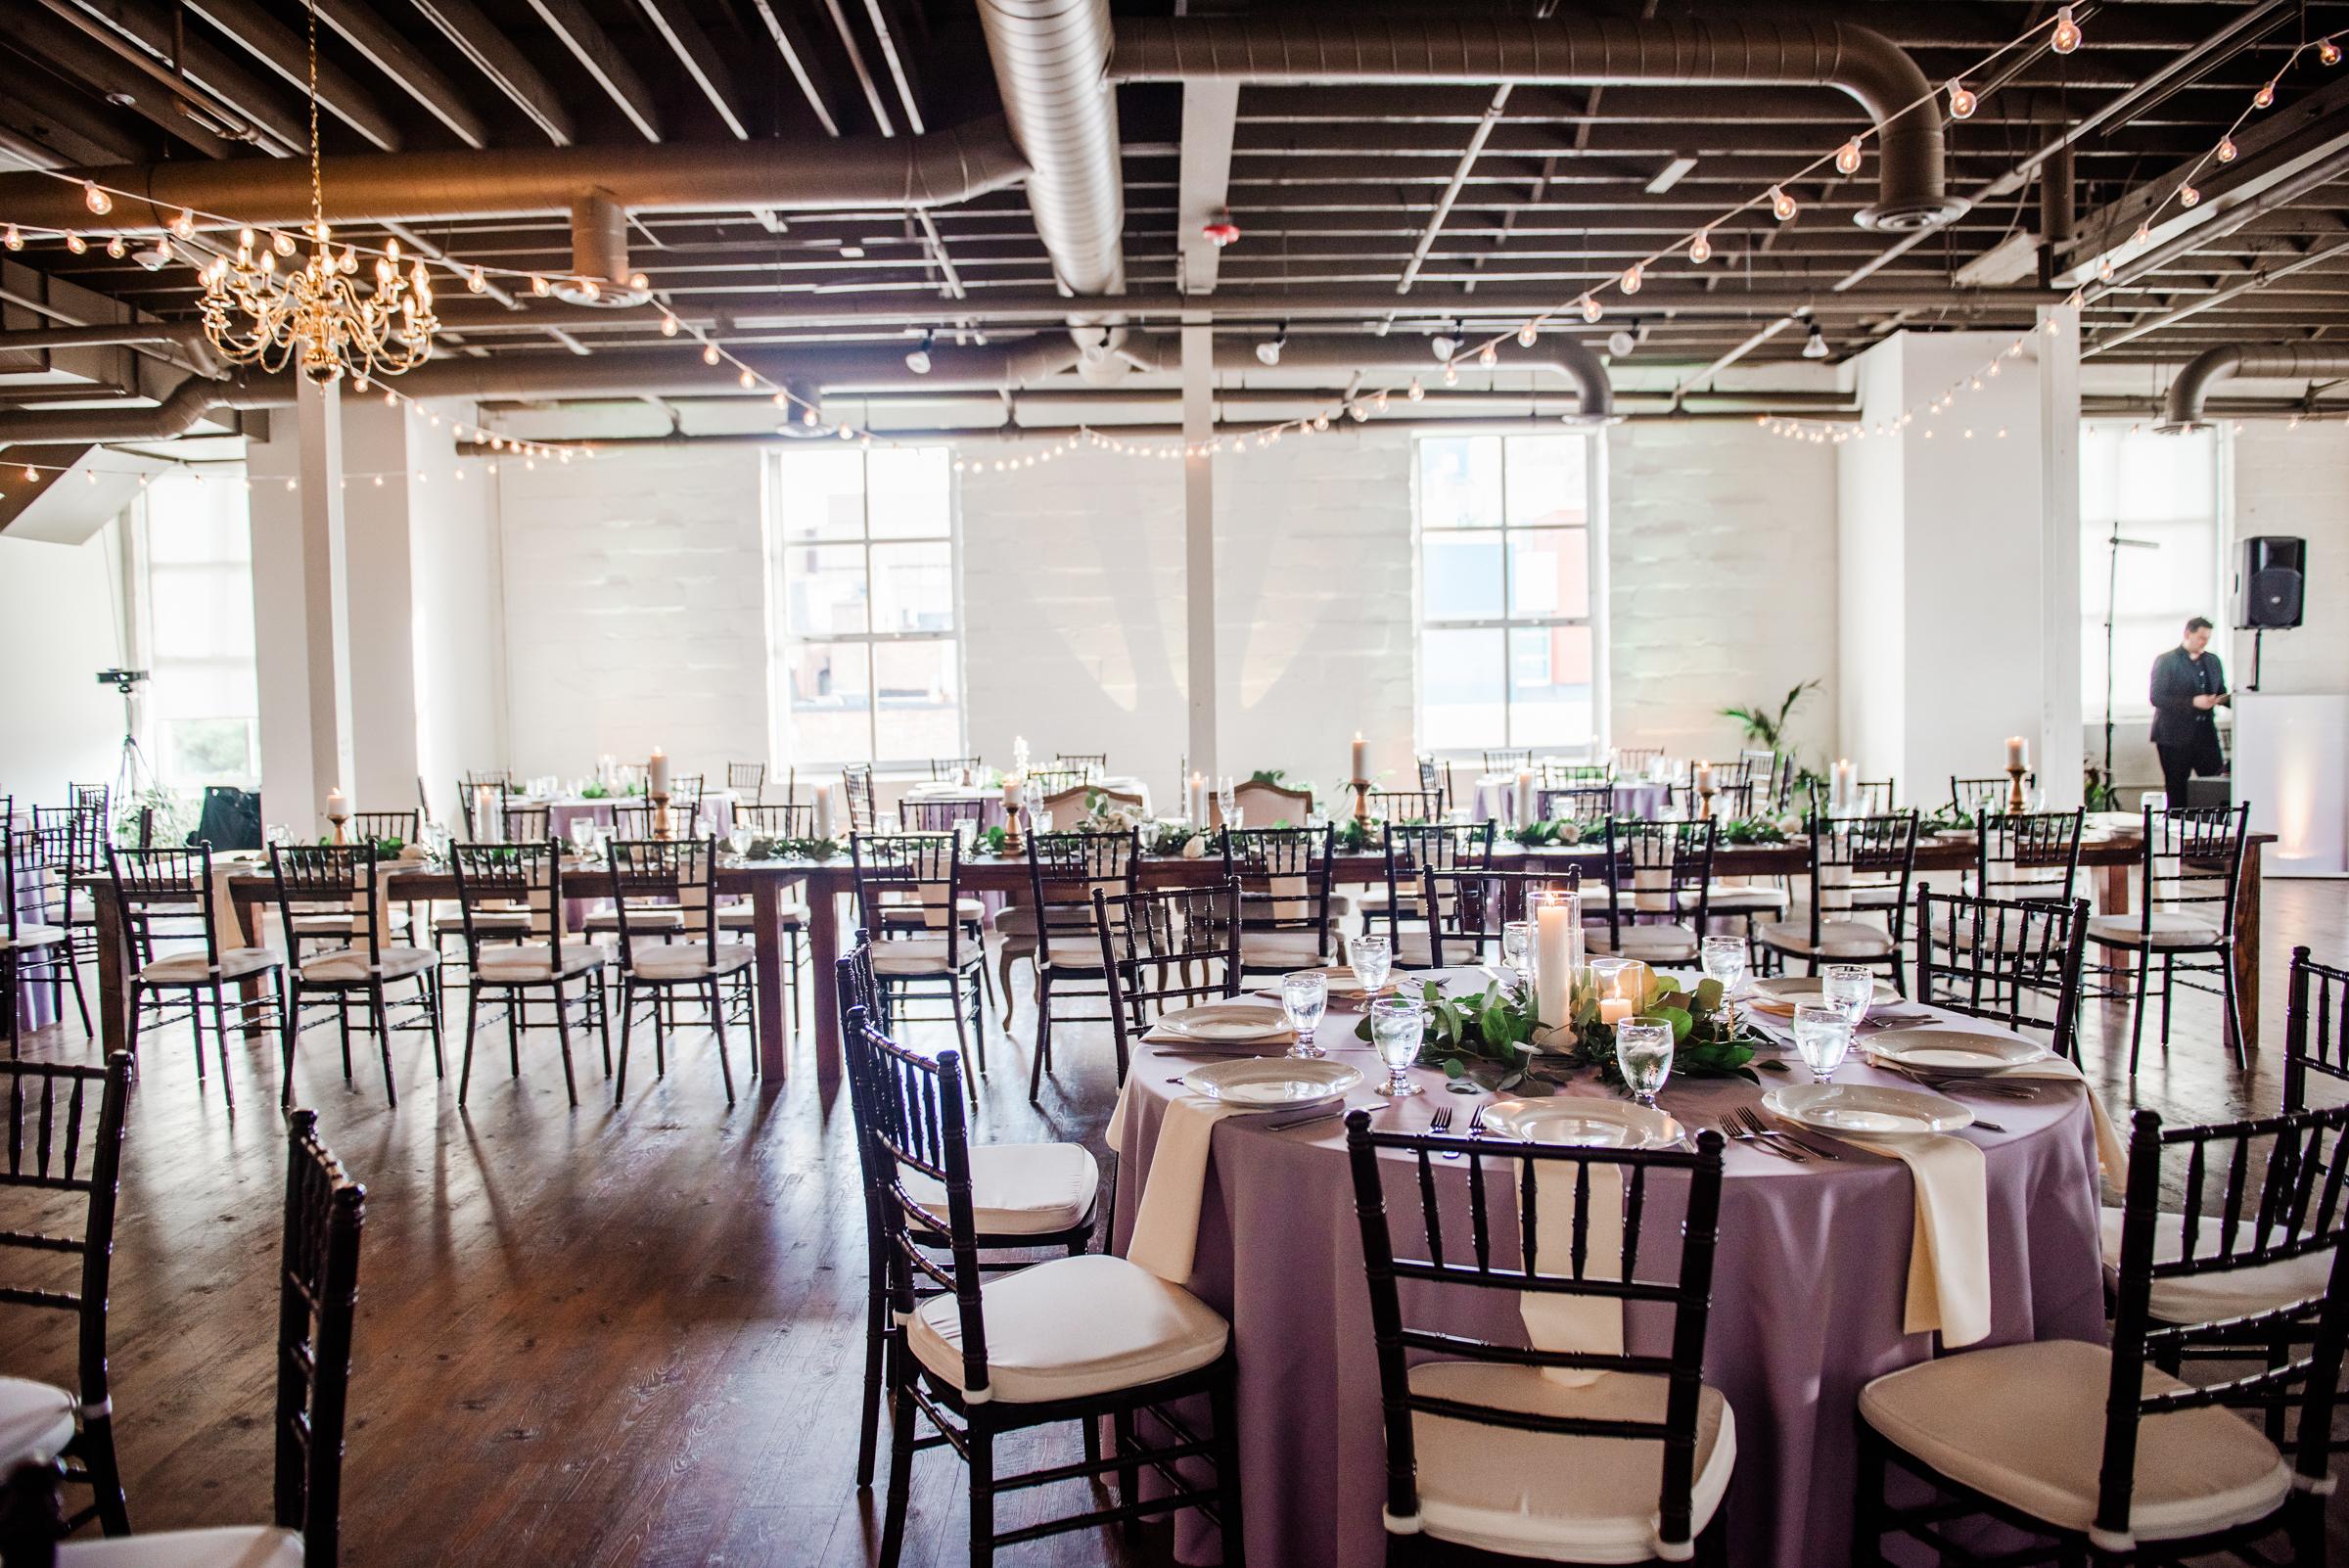 The_Arbor_LoftRochester_Wedding_JILL_STUDIO_Rochester_NY_Photographer_174221.jpg